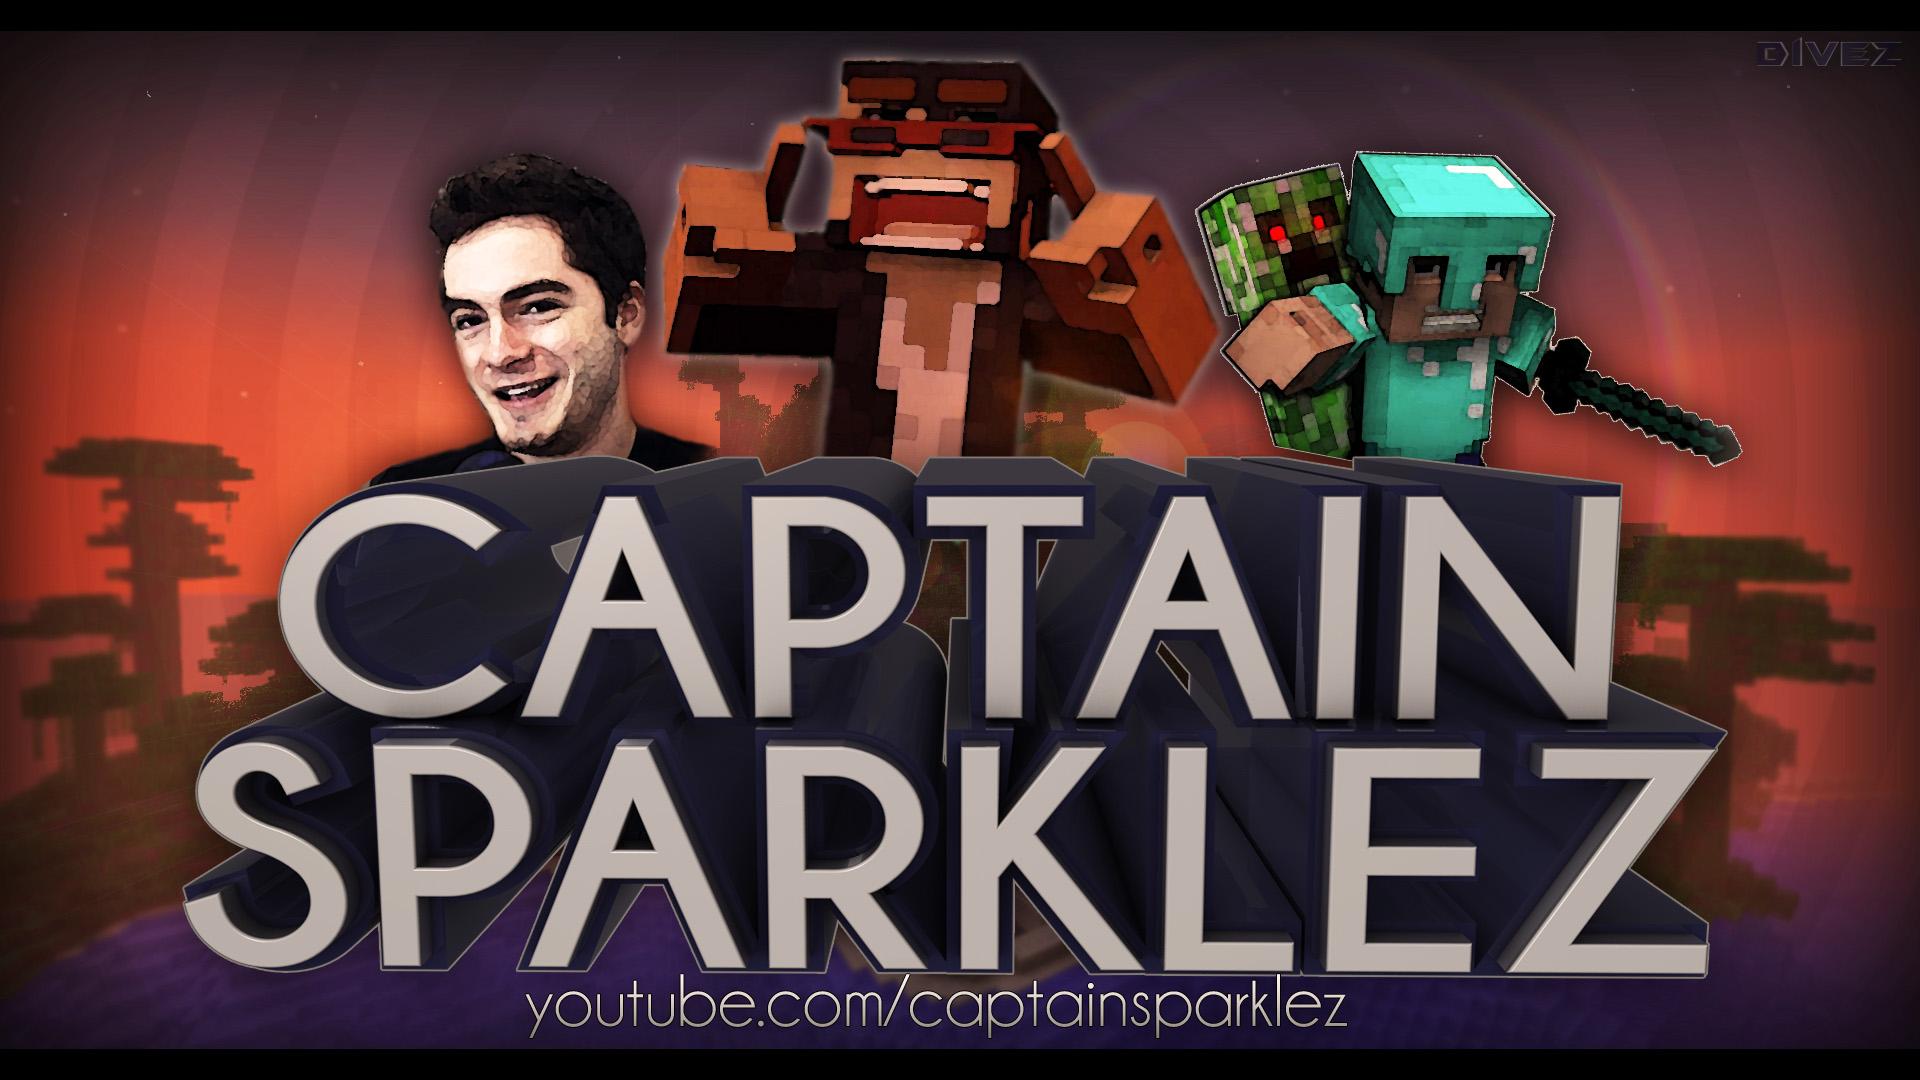 Captainsparklez In Real Life